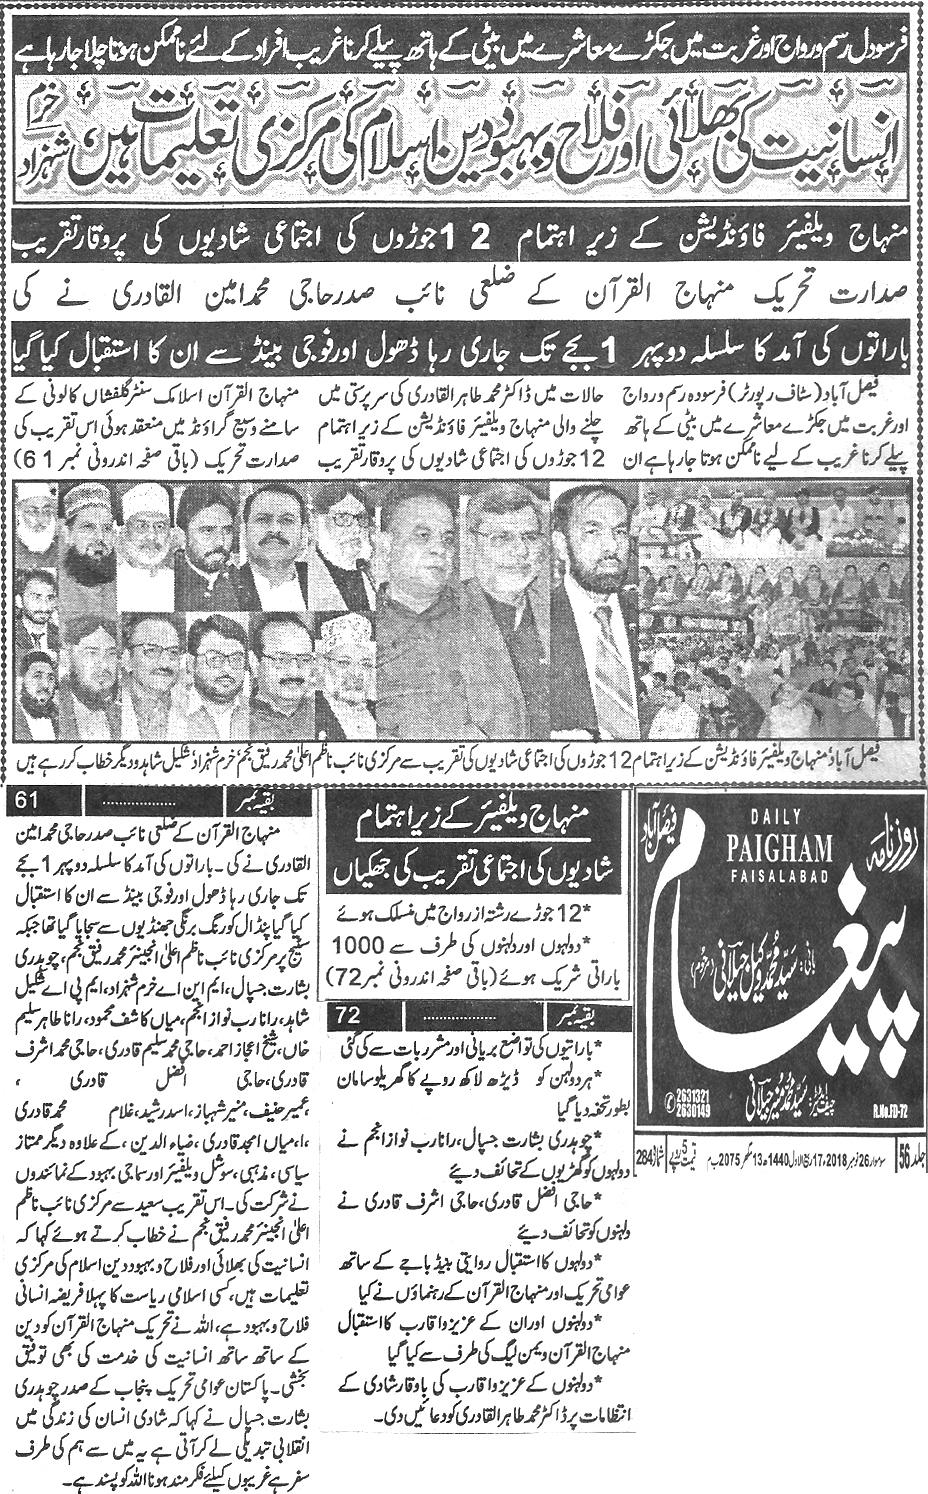 تحریک منہاج القرآن Minhaj-ul-Quran  Print Media Coverage پرنٹ میڈیا کوریج Daily Paigham page 1